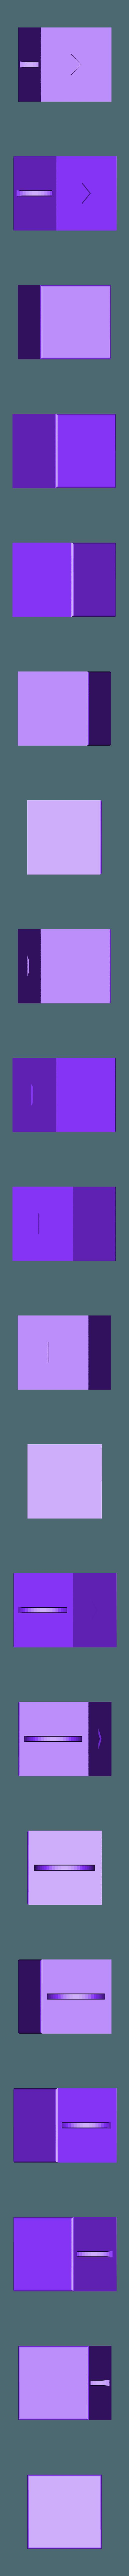 PennyPixelBlockArt3Faces.stl Download free STL file 3D Penny-Powered Pixel Art Blocks - Video Game Art • Model to 3D print, tonyyoungblood